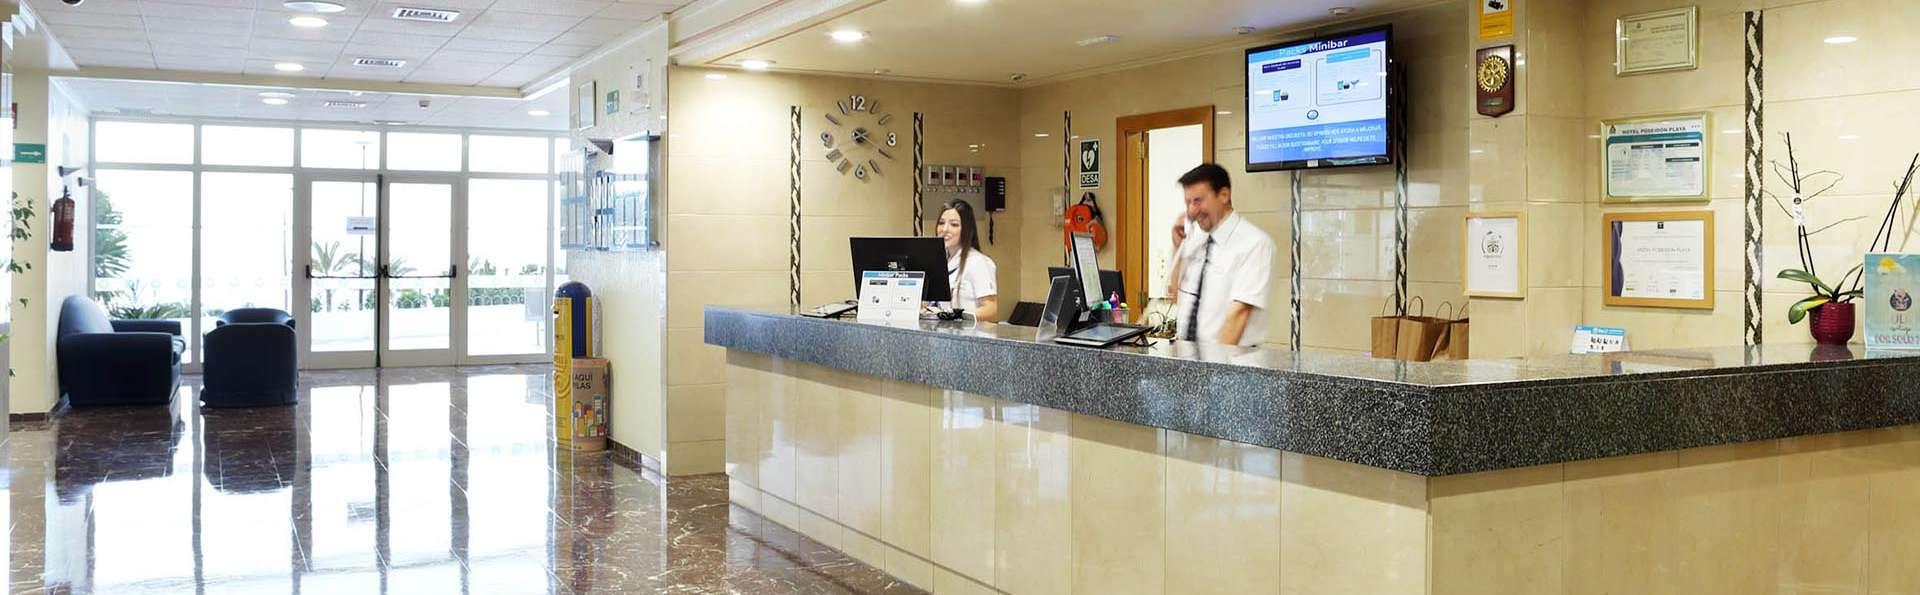 Hotel Poseidon Playa - EDIT_RECEPTION_01.jpg